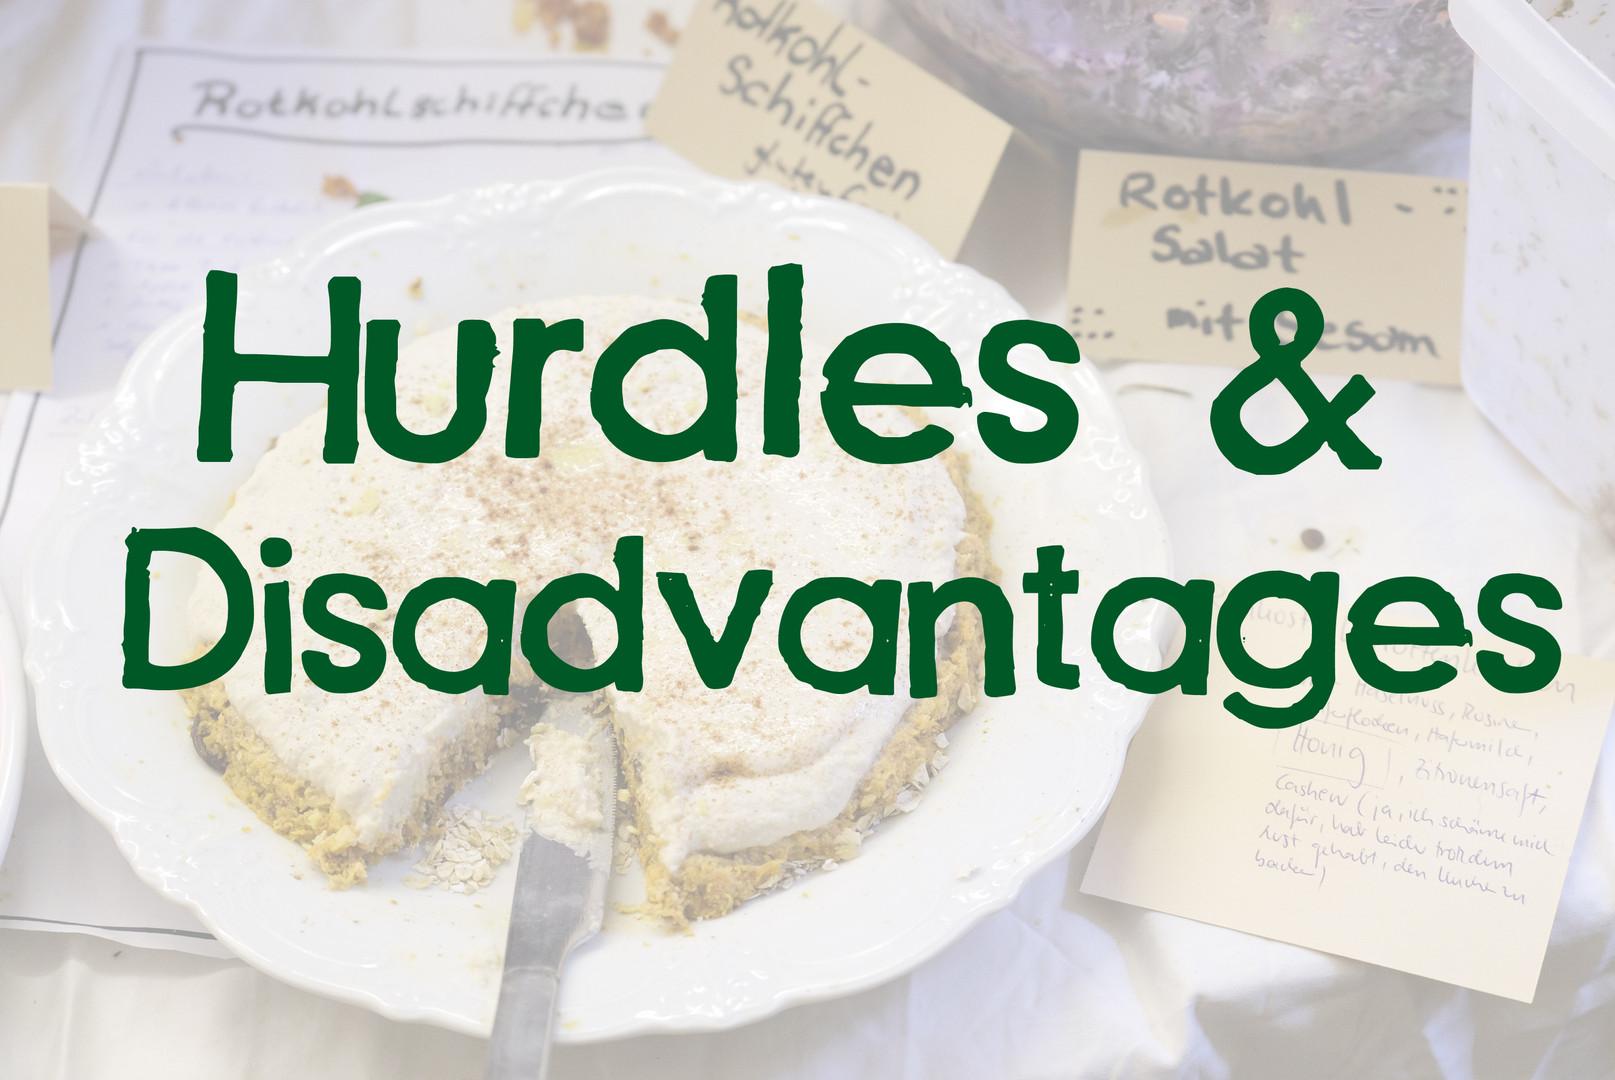 Hurdles & Disadvantages